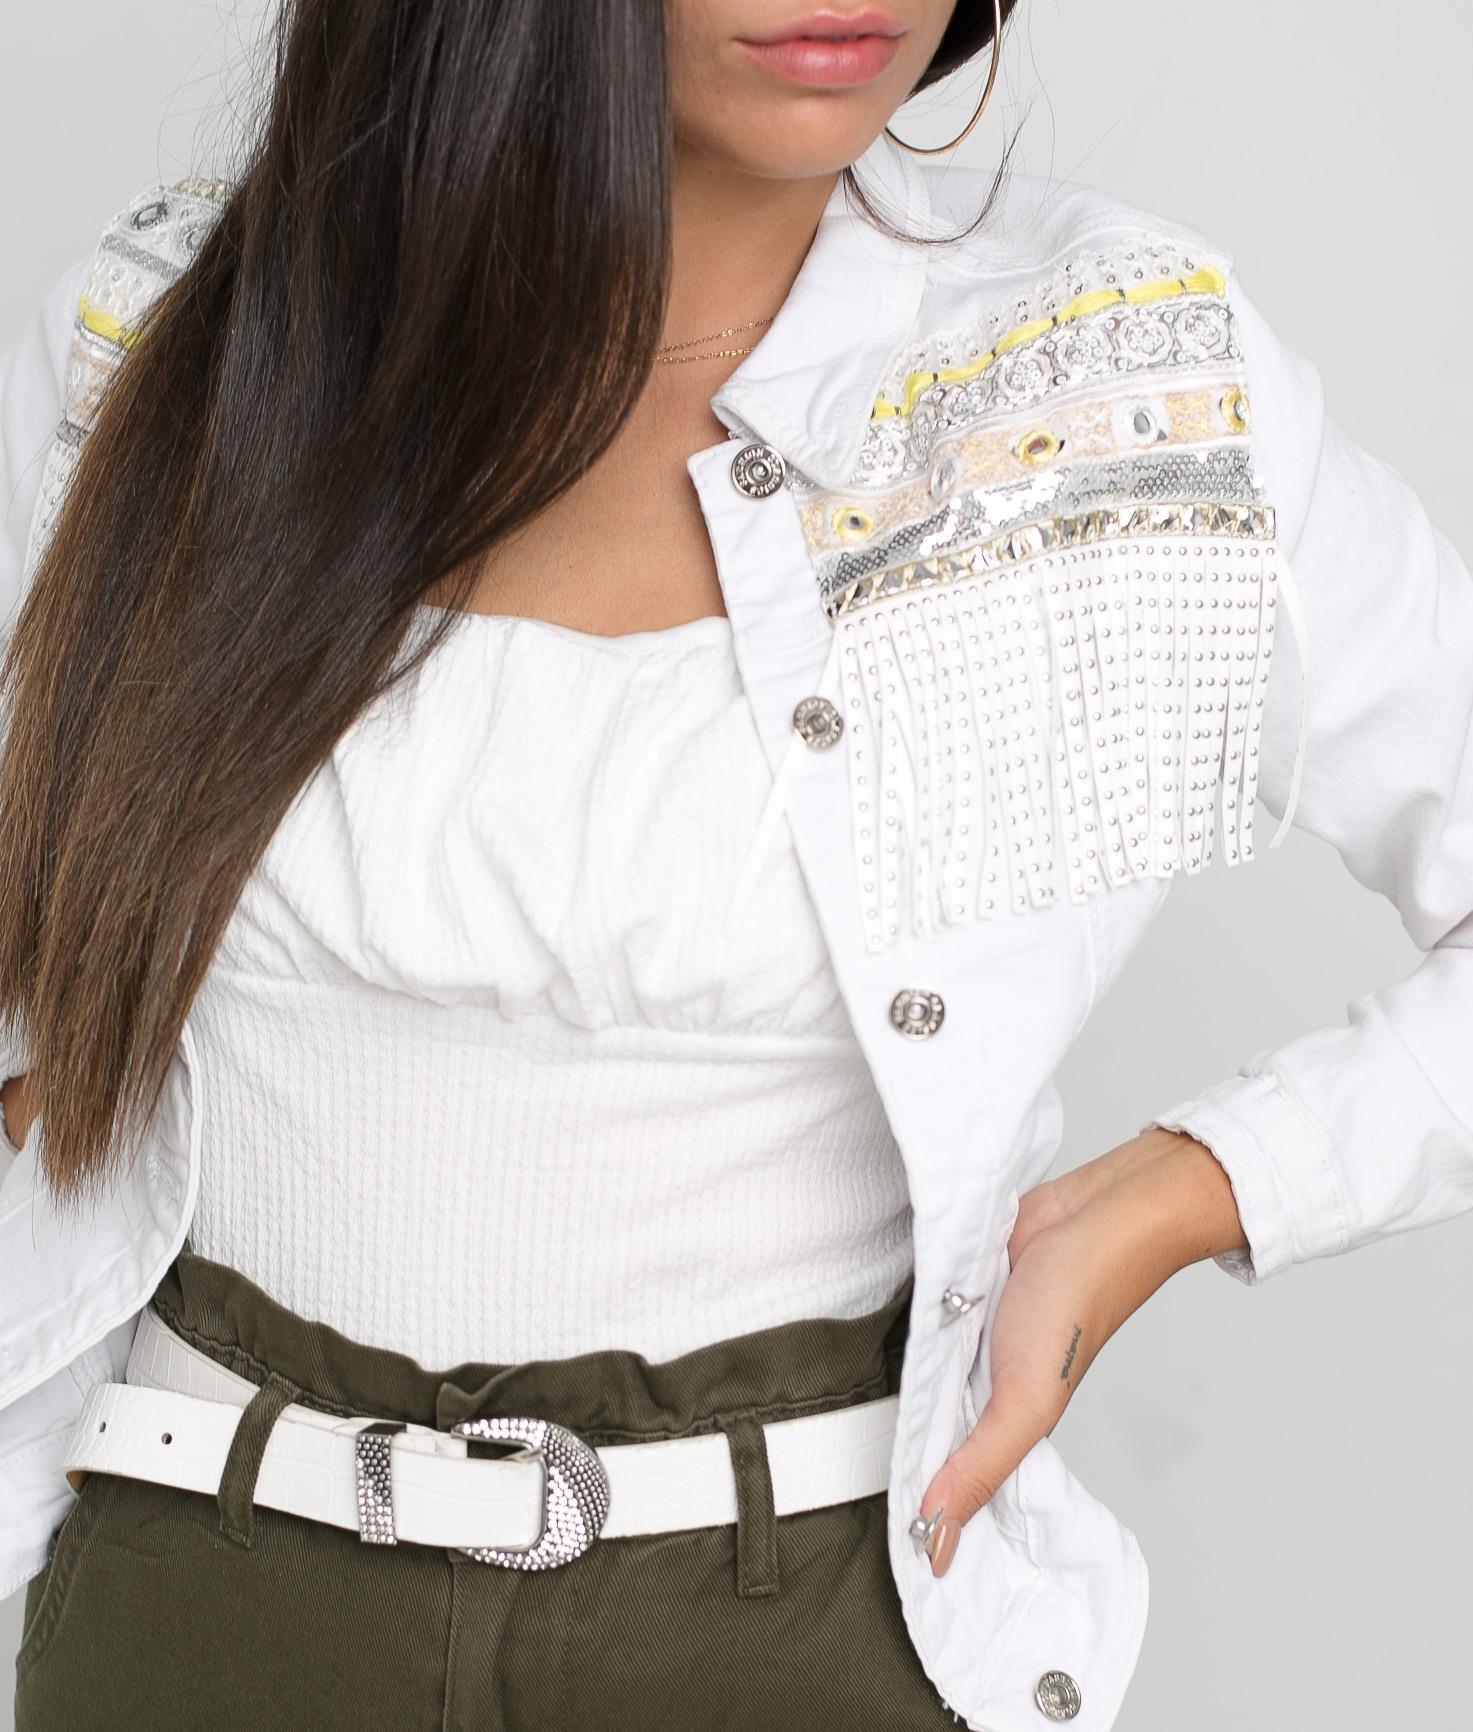 Munagu jacket - White